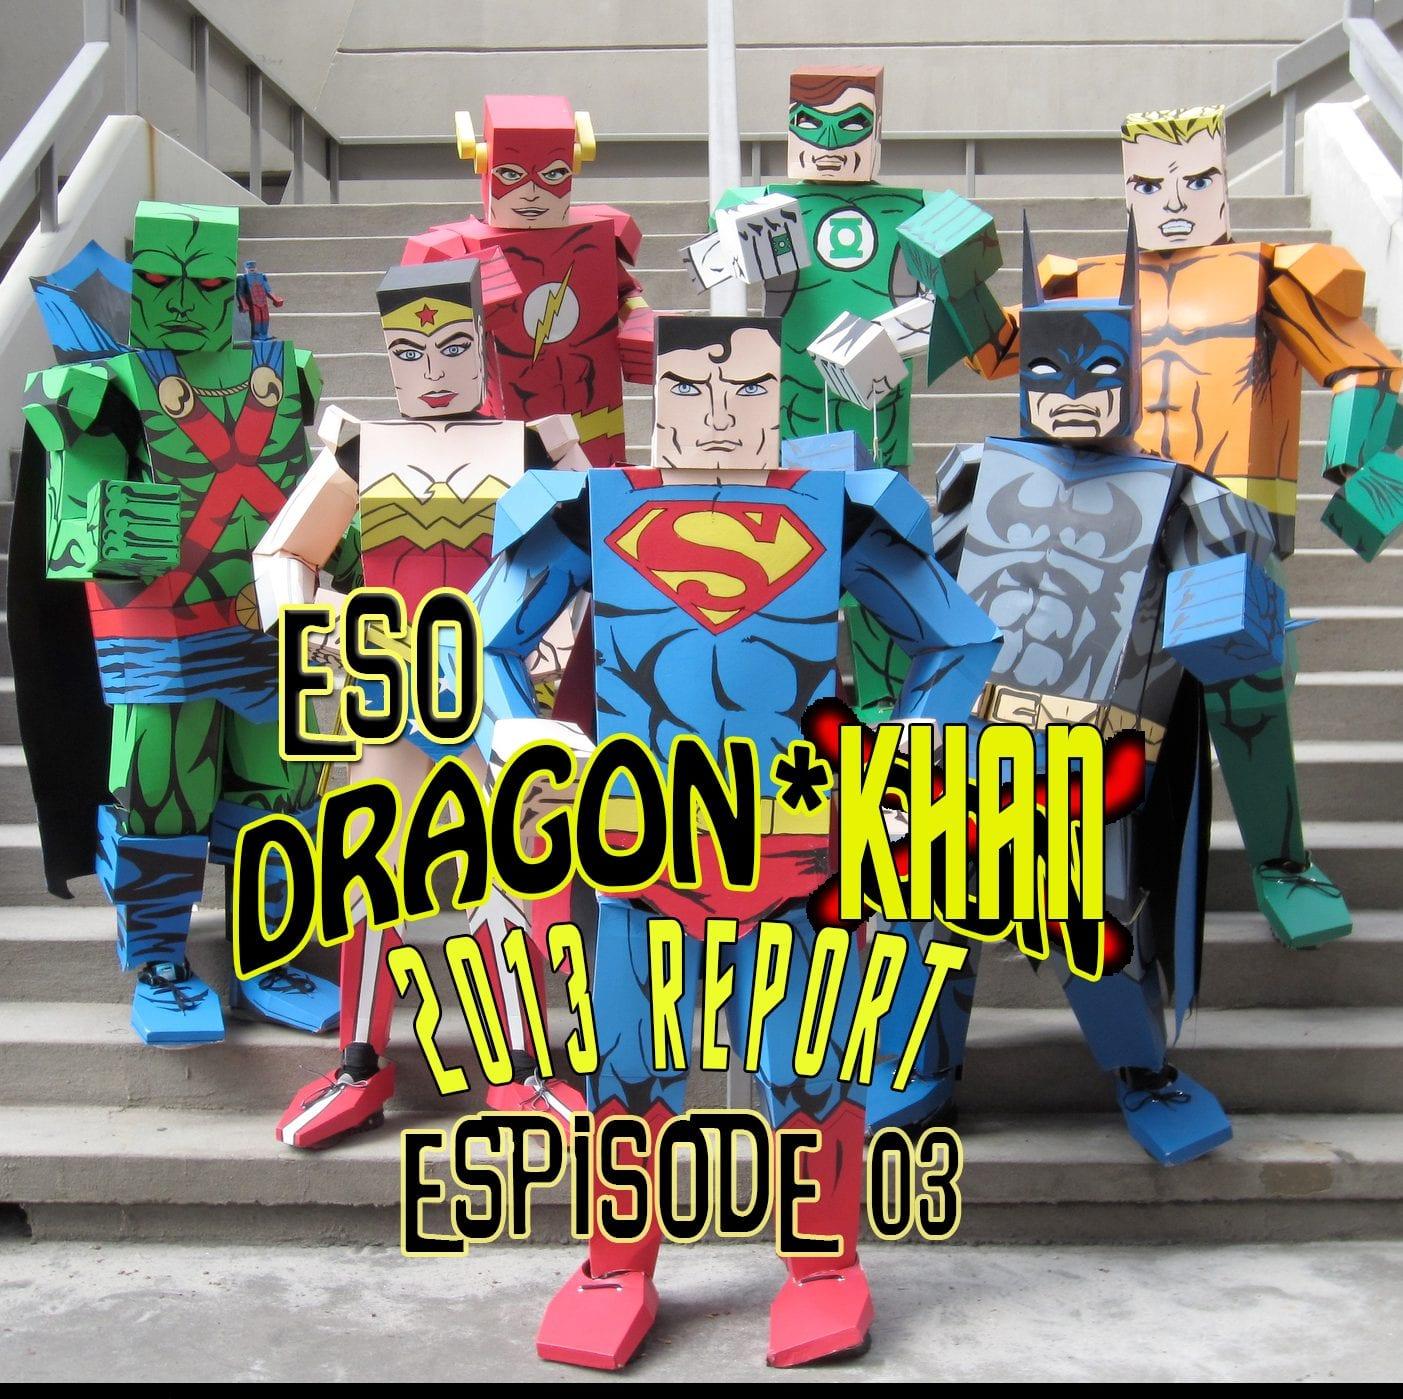 ESO Dragon*Con Khan Report 2013 ep 3